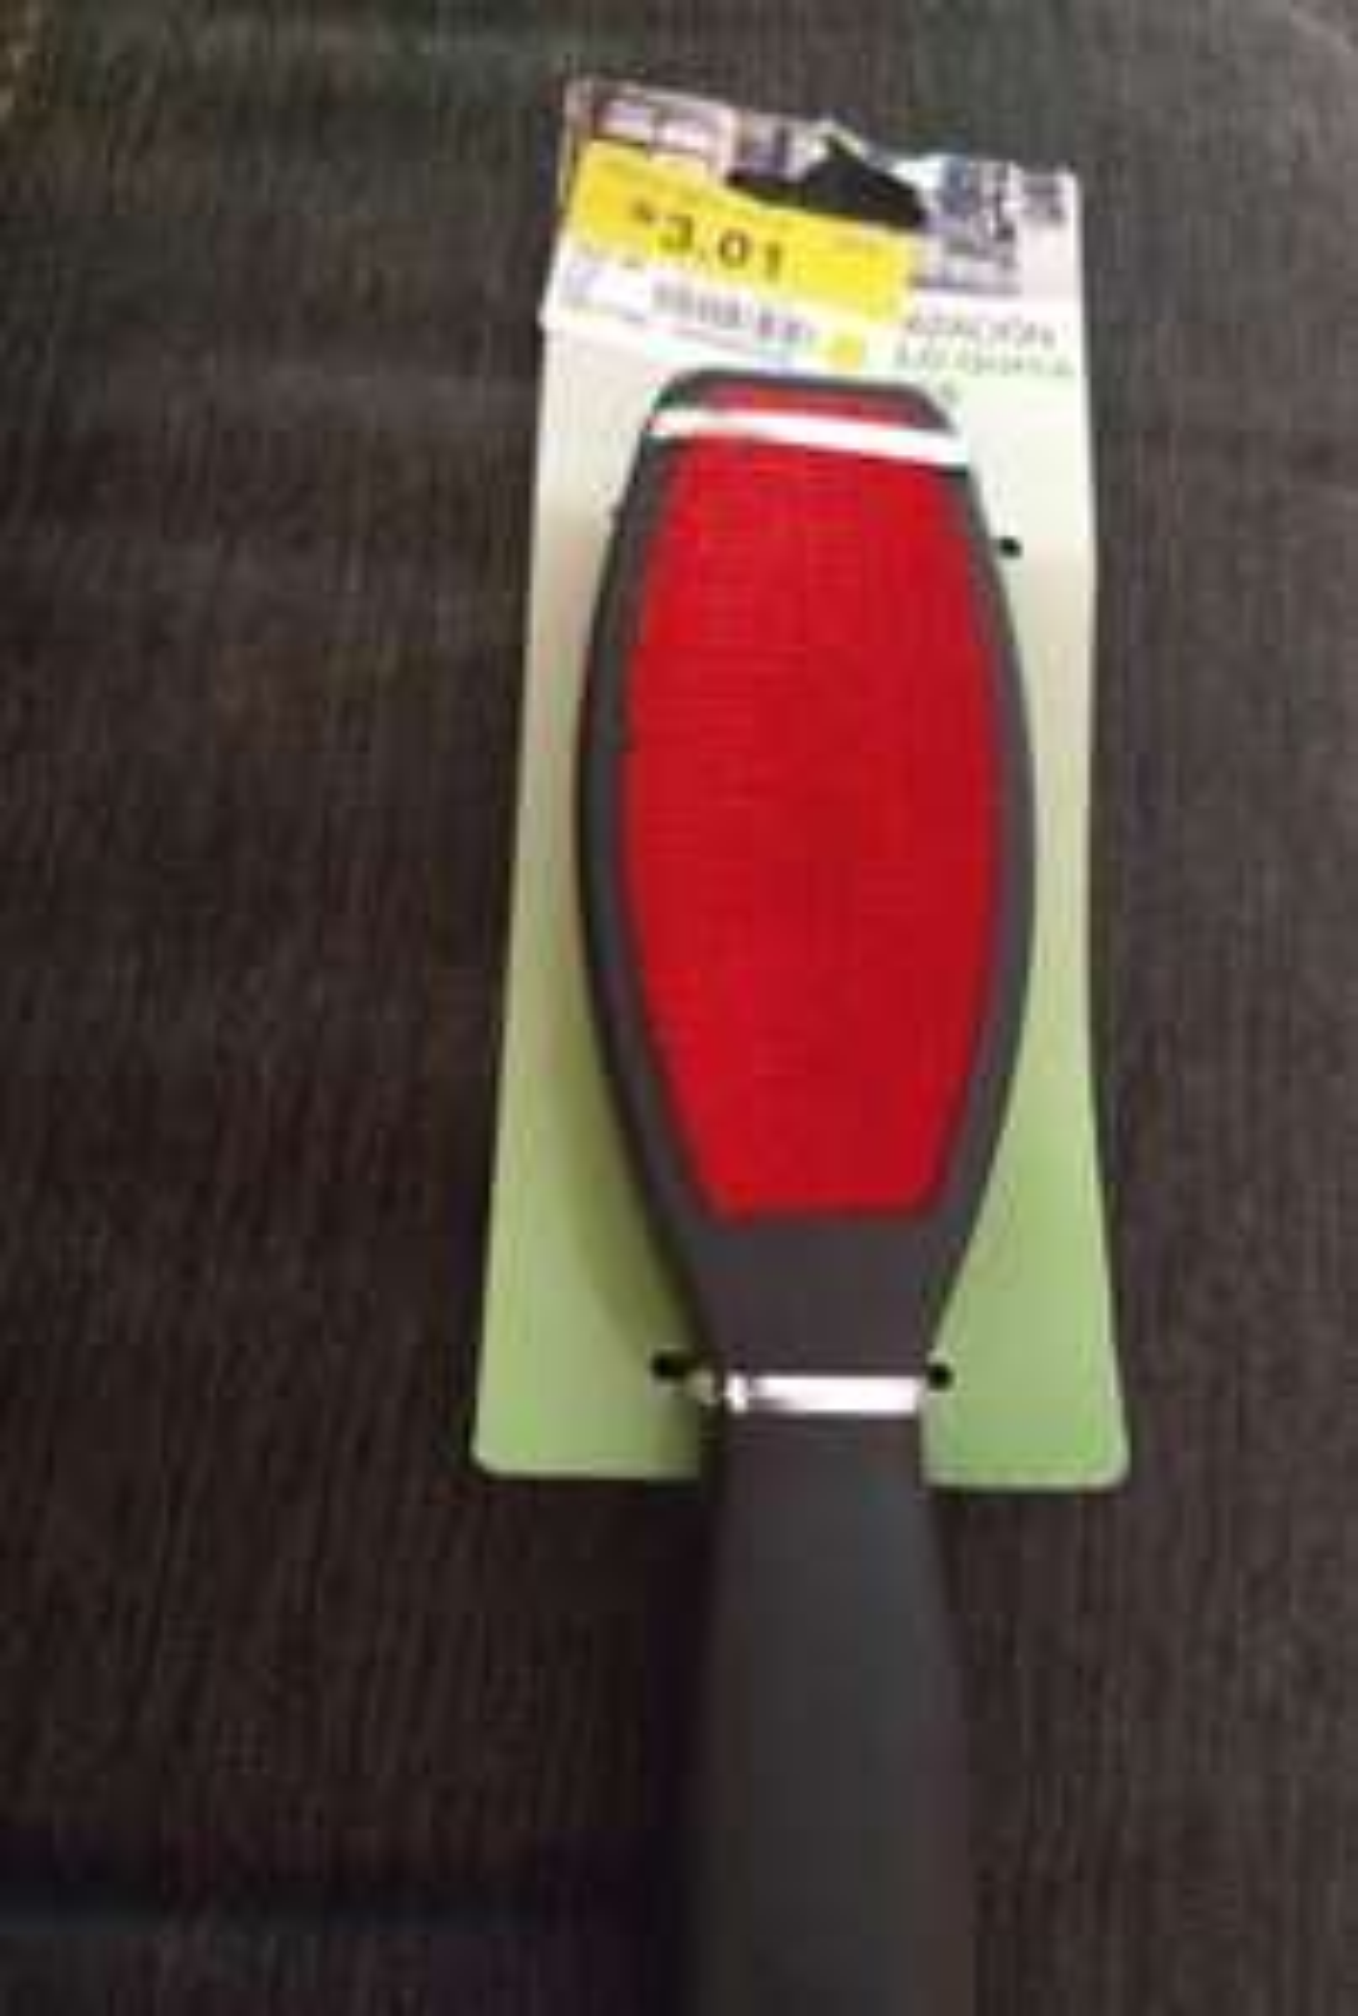 Bodega Aurrerá: cepillo quita pelusa y lentes de luz